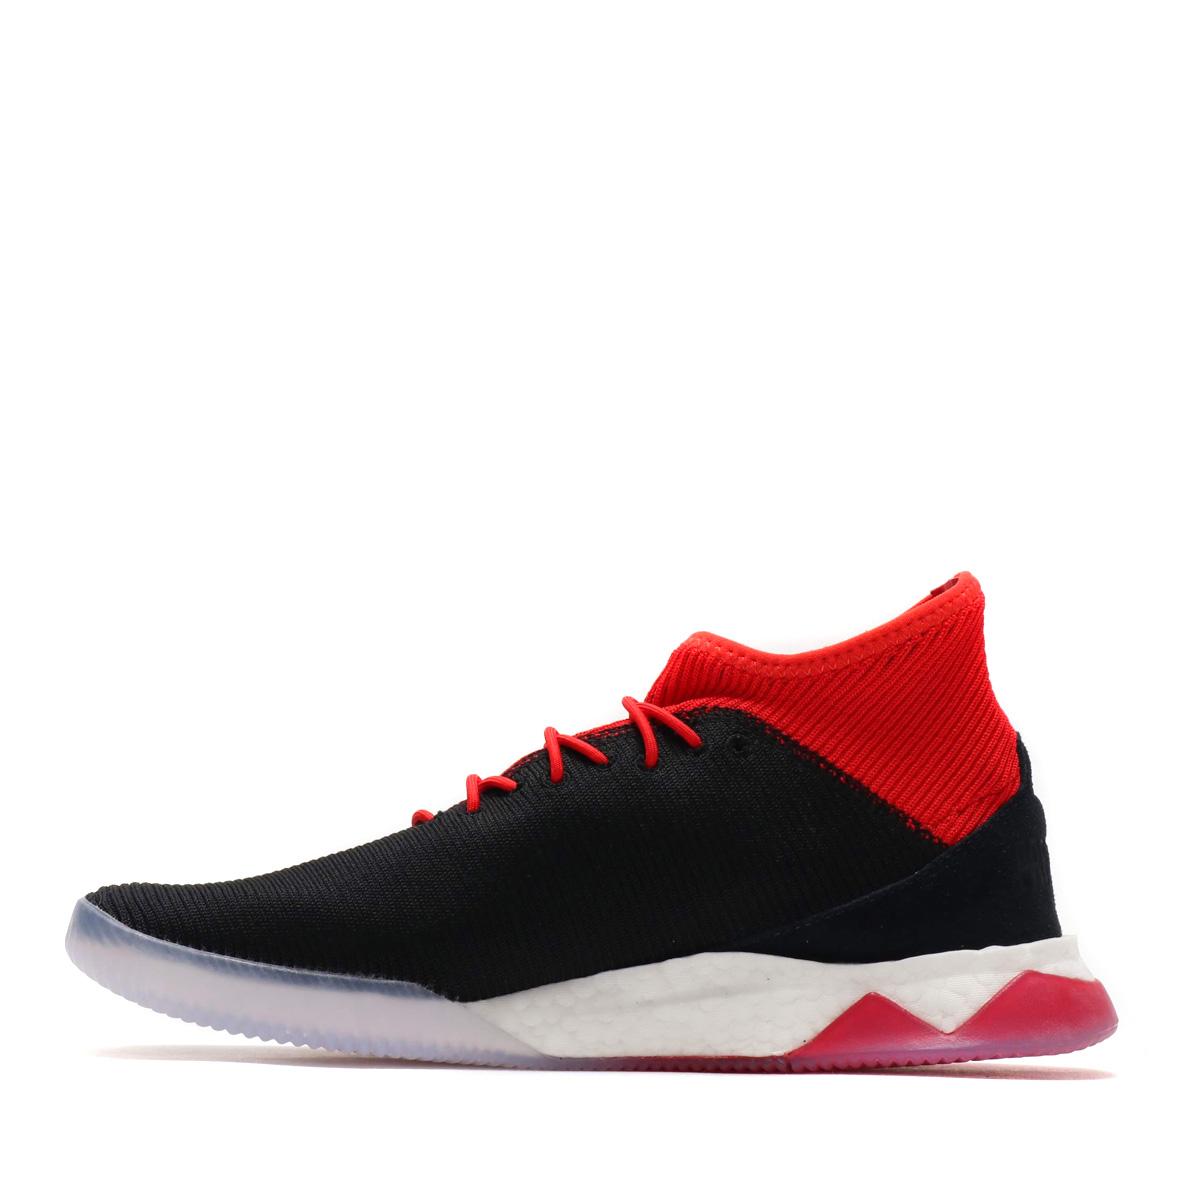 037a4aafd7c adidas PREDATOR TANGO 18.1 TR (Adidas predator tango 18.1 TR) CORE BLACK RUNNING  WHITE RED 18FW-I